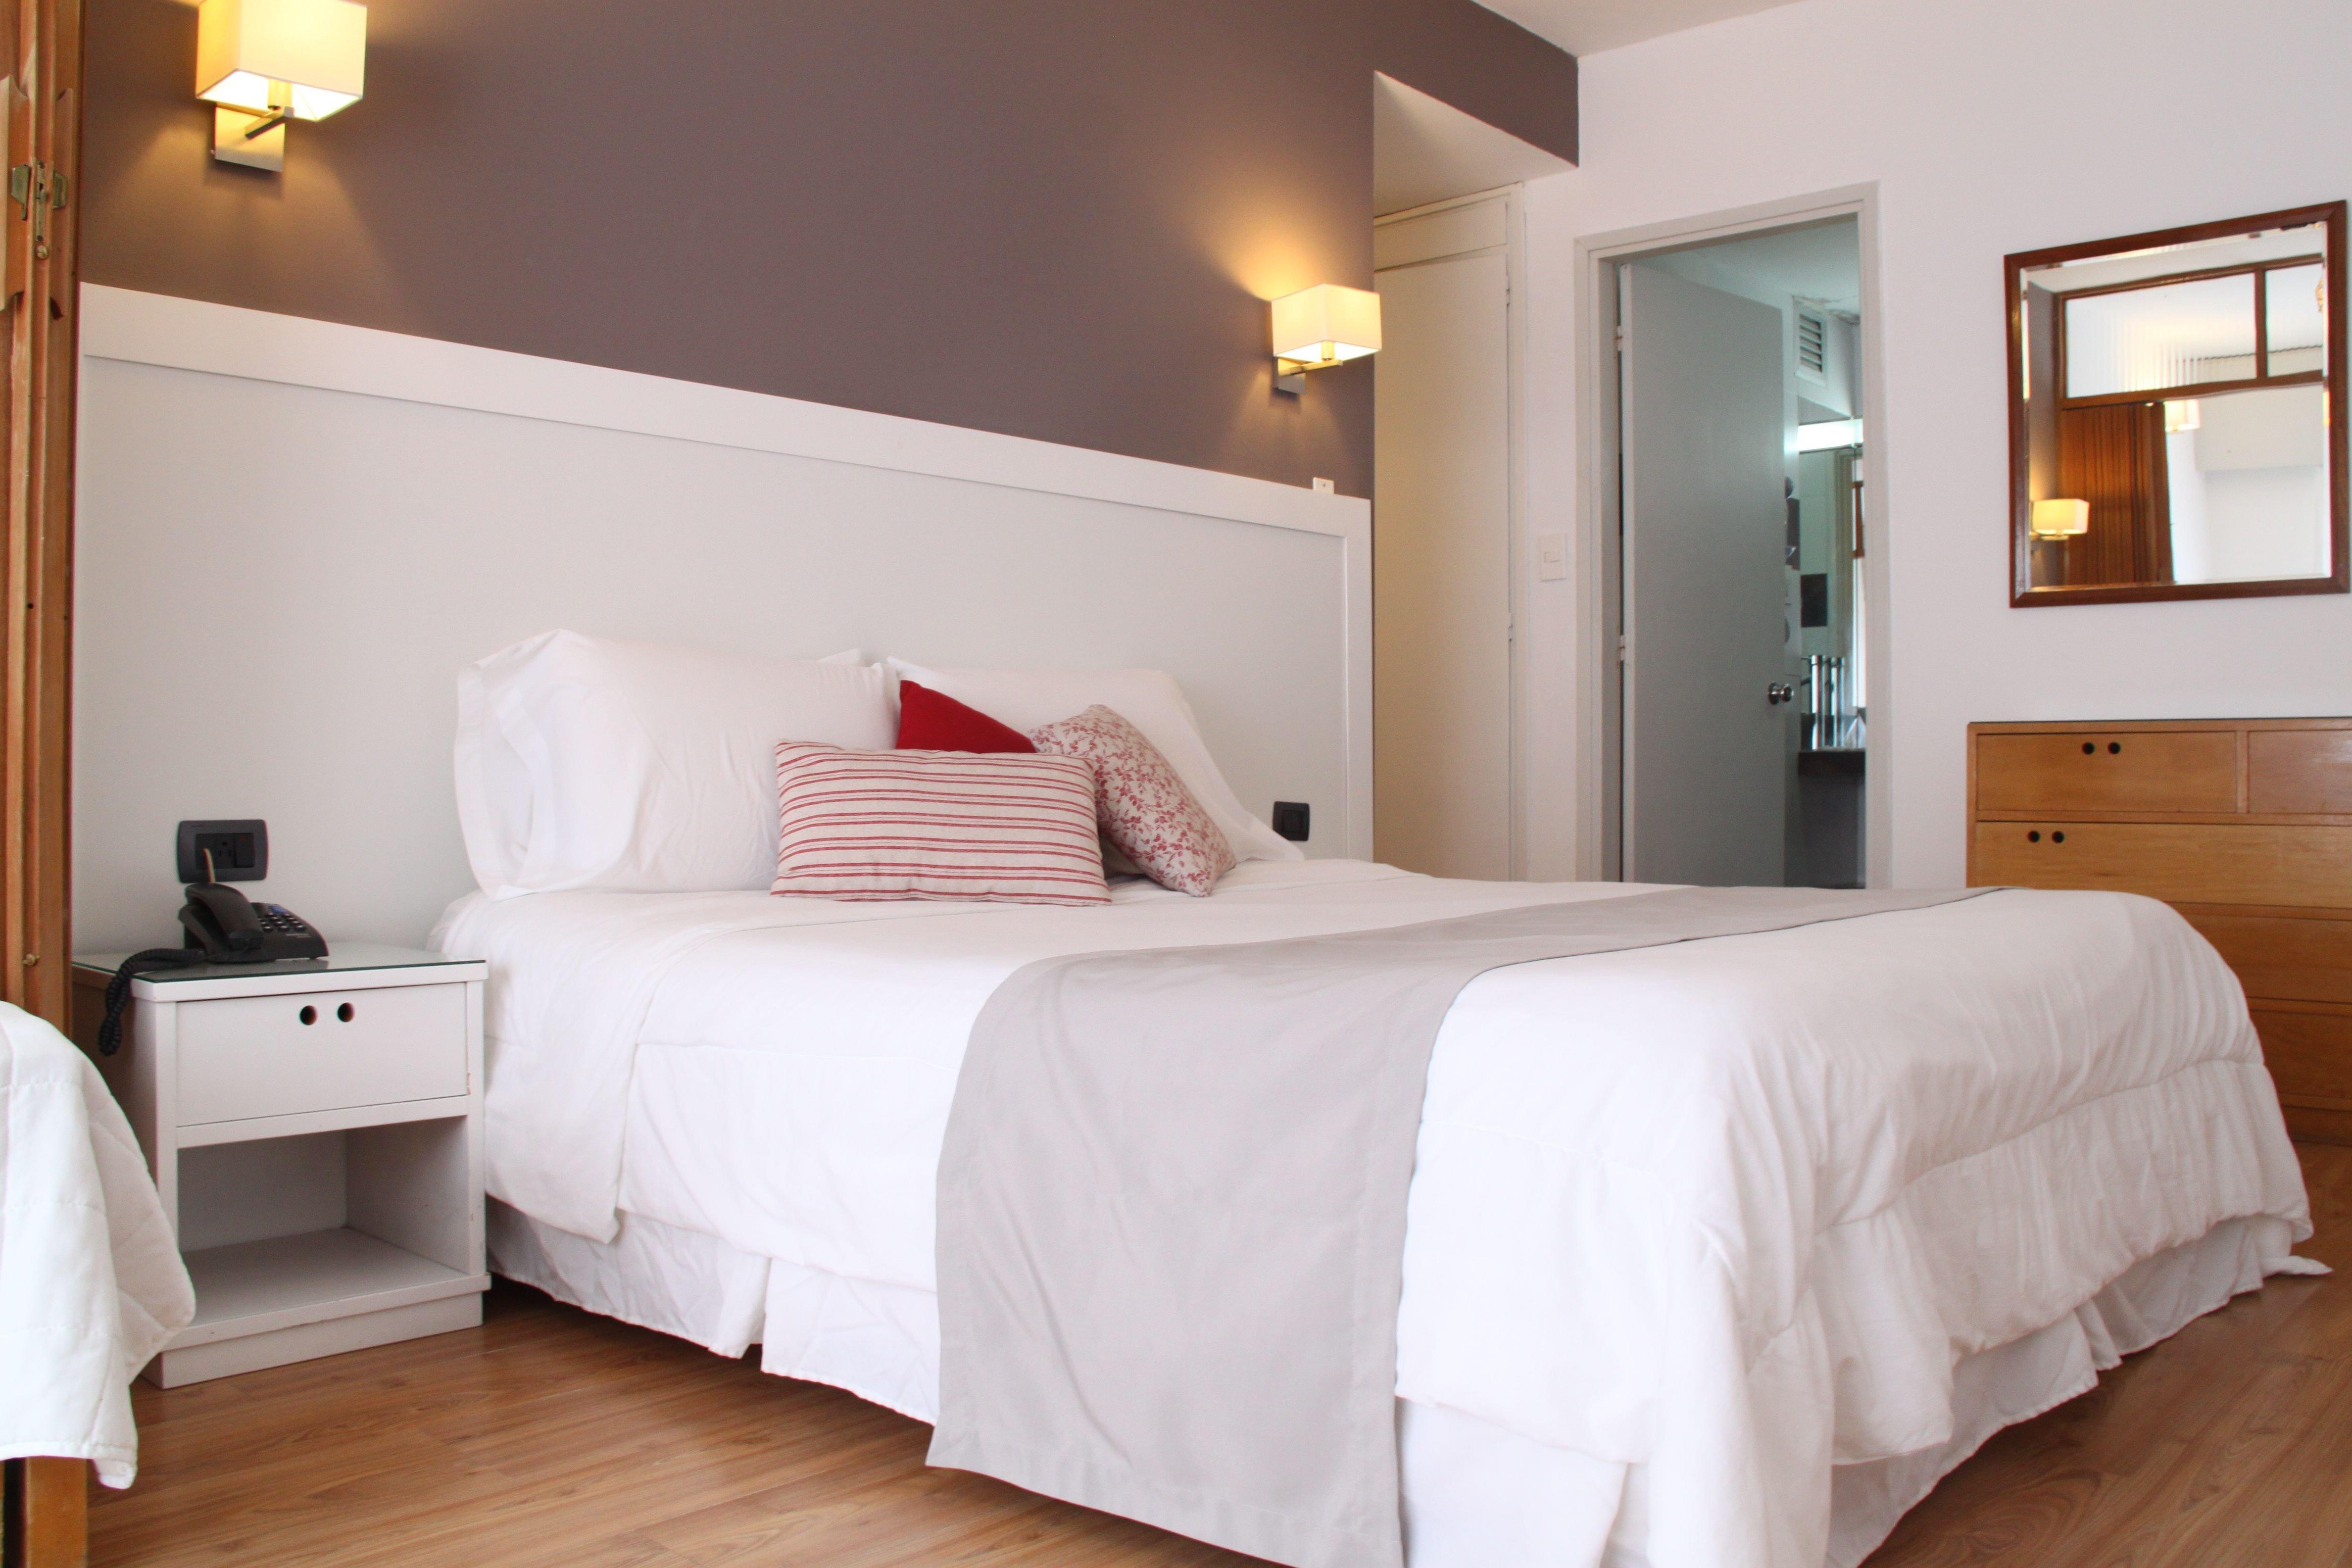 Quarto Para Quatro Pessoas Hotel Milano Pen Nsula Punta Del Este # Quartos Muebles